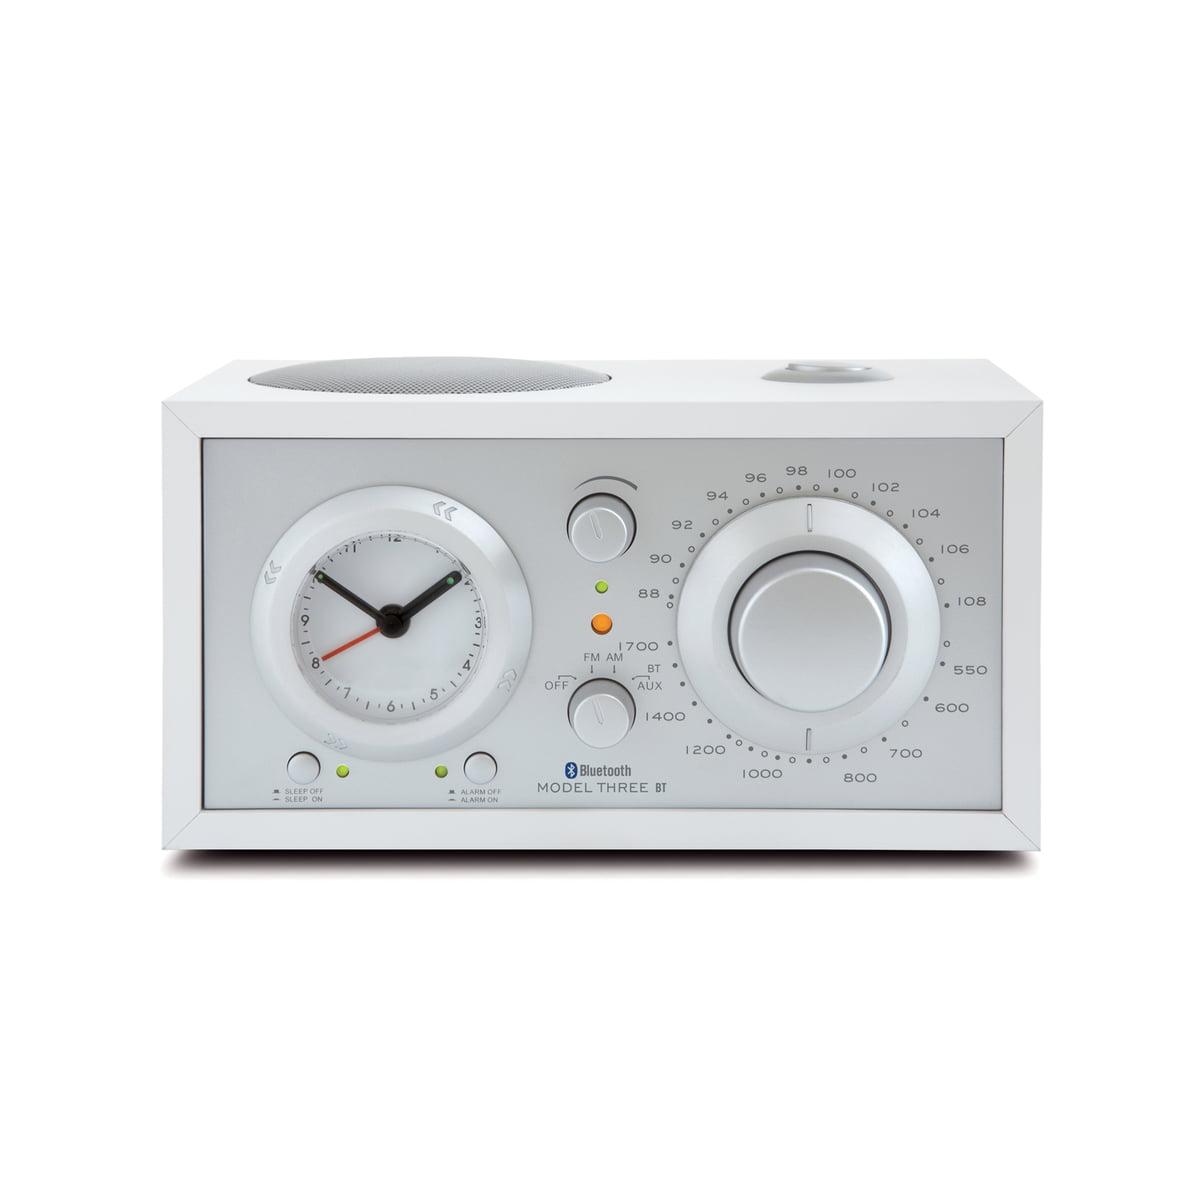 Tivoli Audio - Model Three BT Radiowecker, weiß / silber   Dekoration > Uhren > Wecker   Weiß   Tivoli Audio